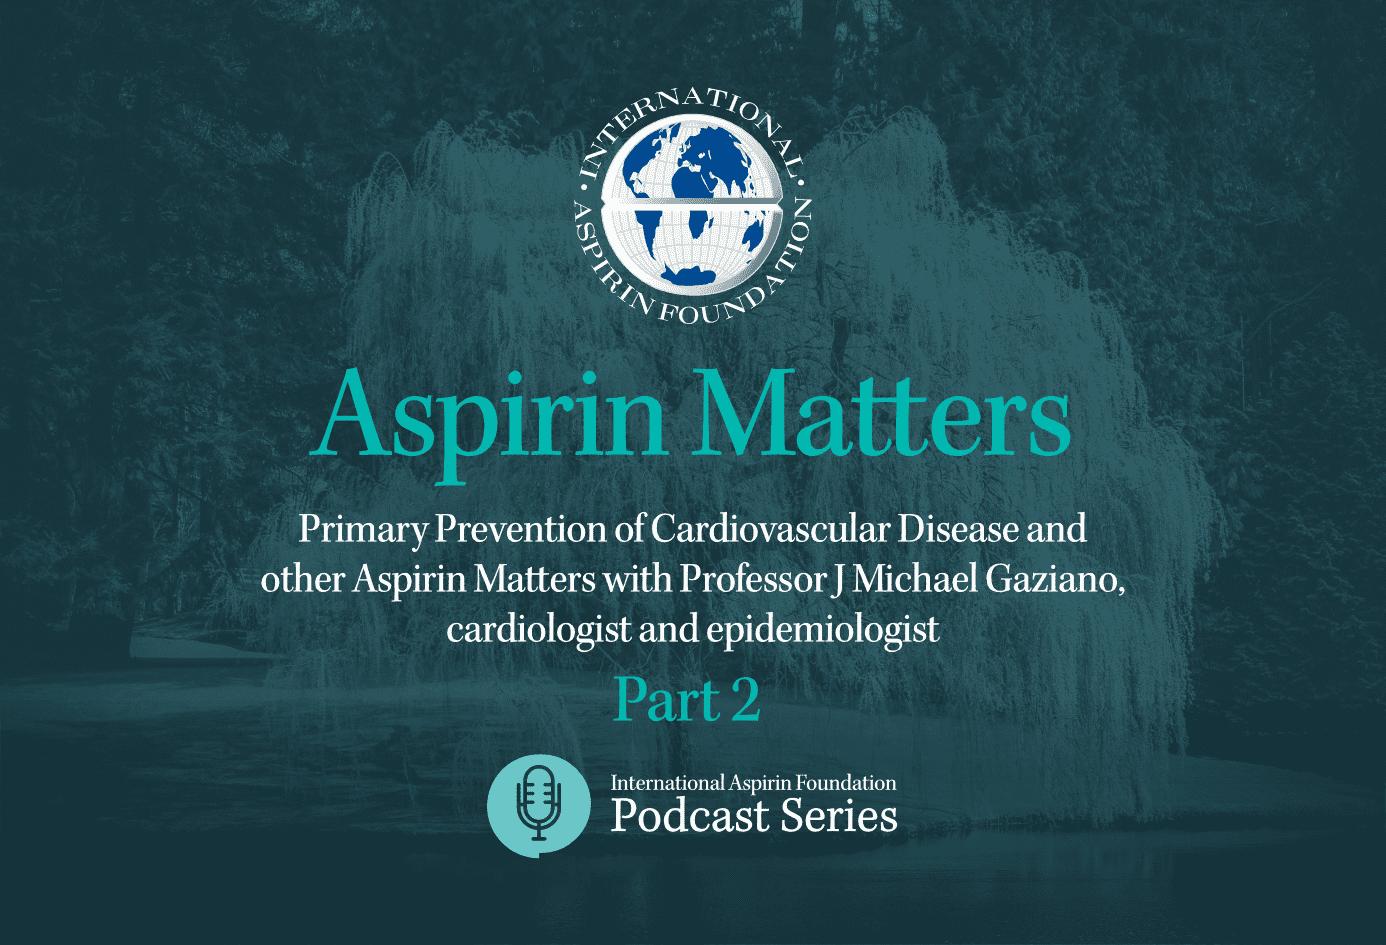 Aspirin Matter Podcasts 110221 Page 5